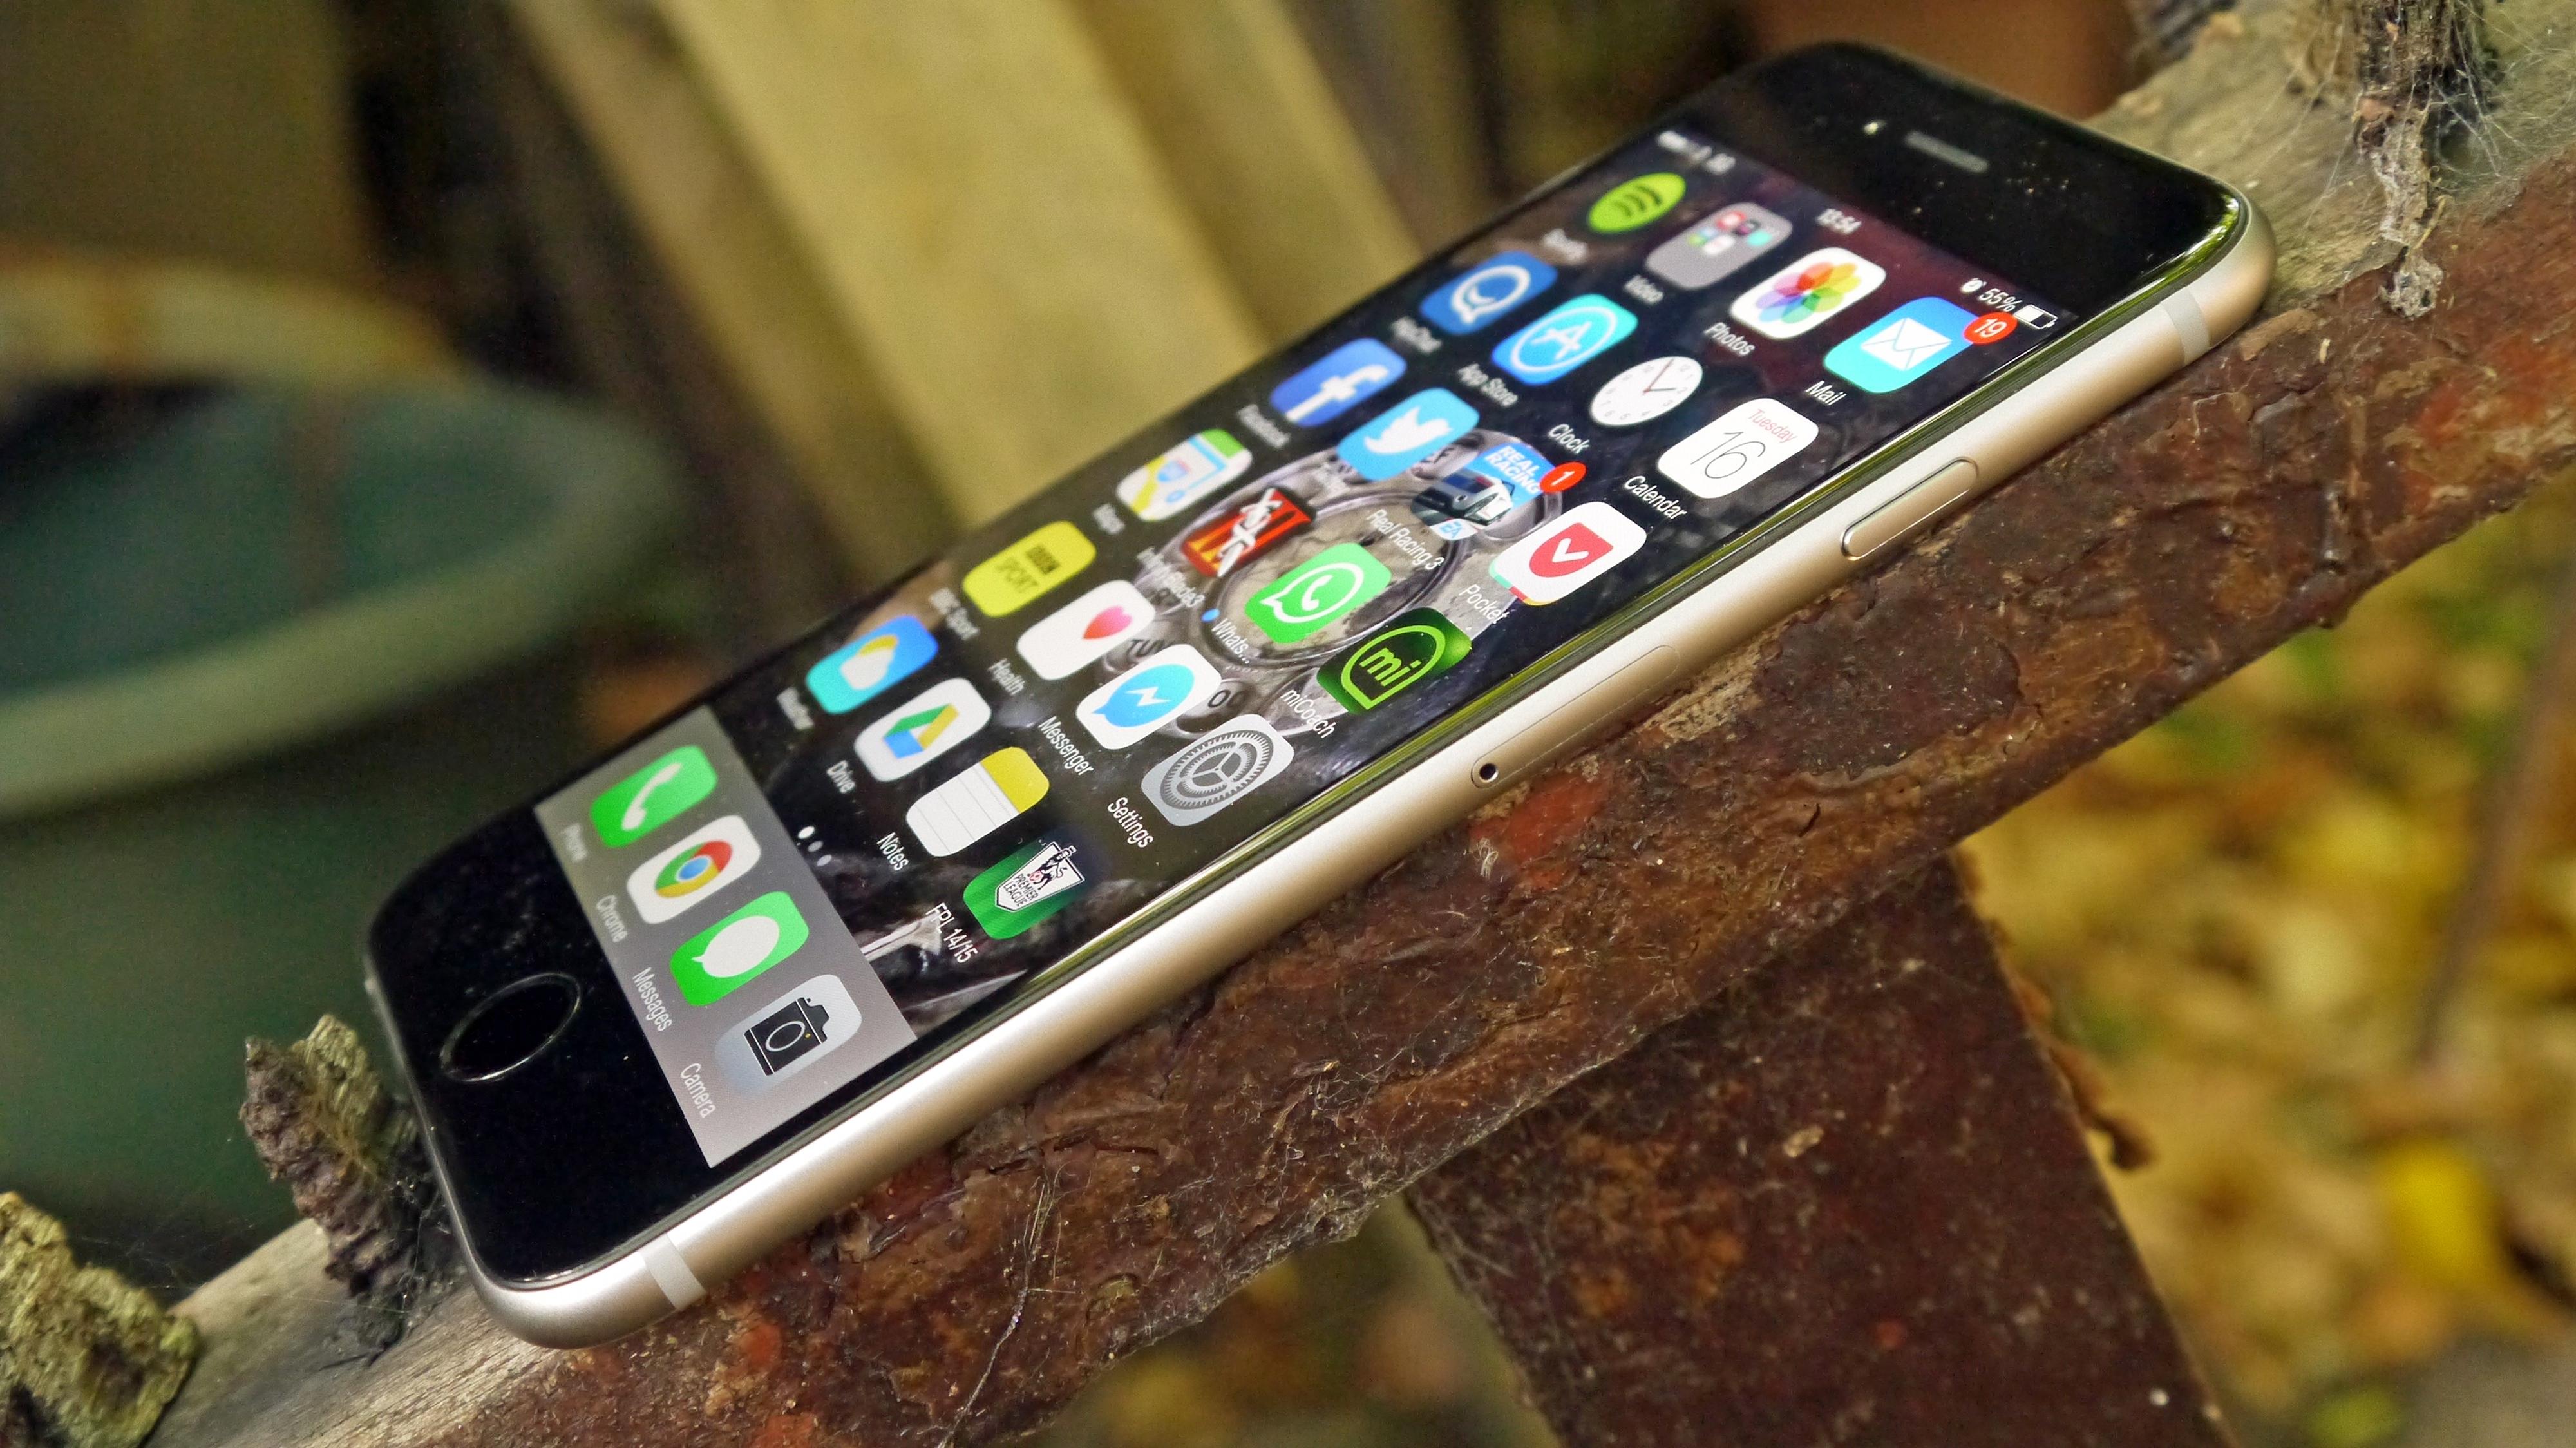 http://www.techradar.com/reviews/phones/mobile-phones/iphone-5s-1179315/review